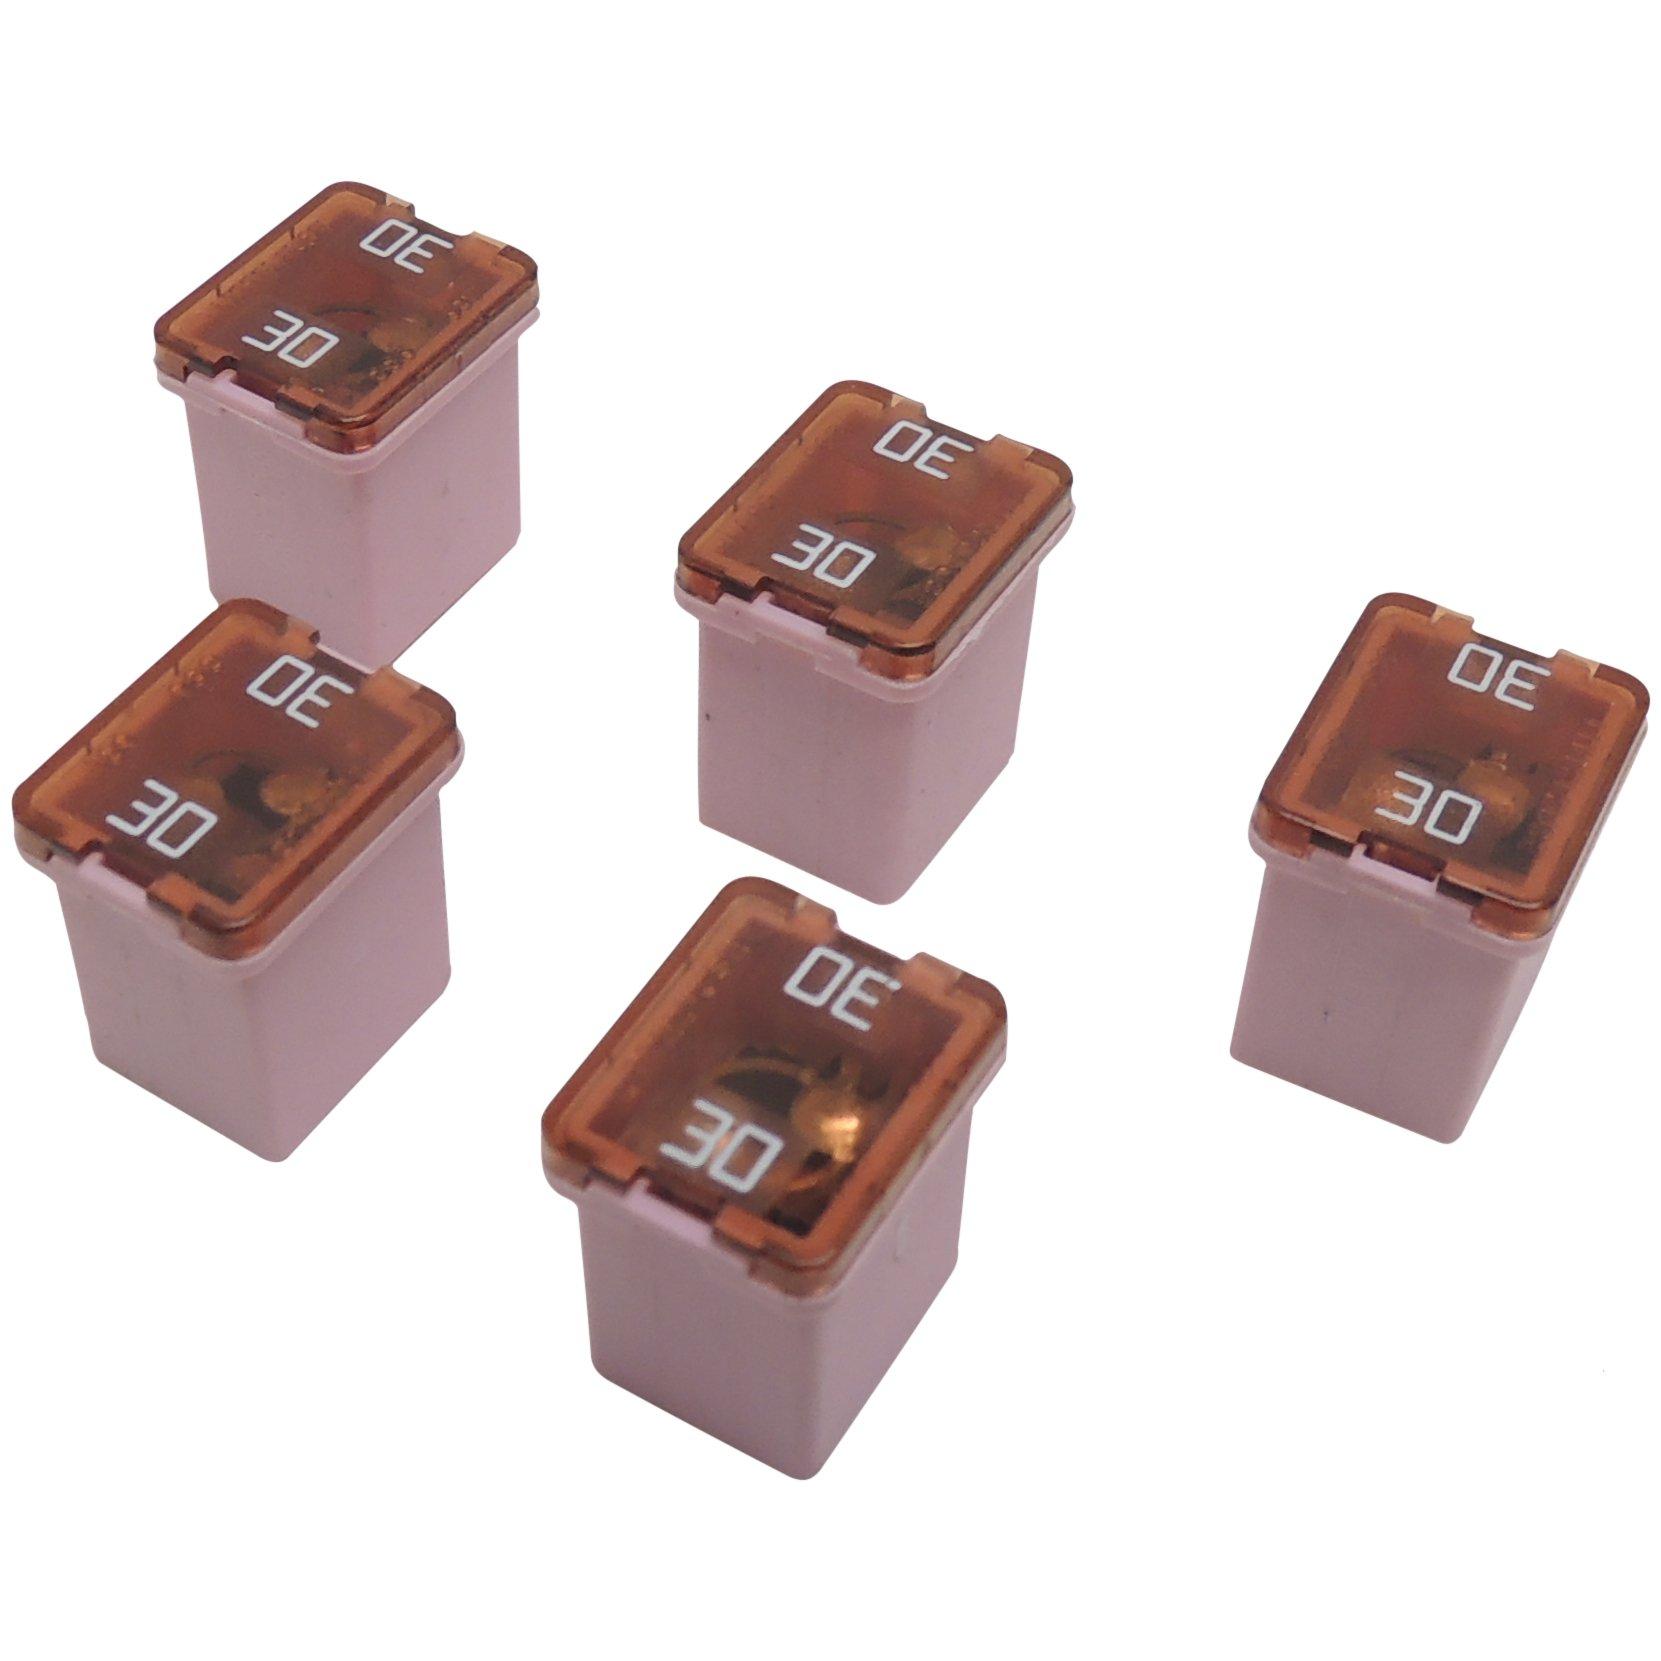 30 Amp 58V Low Profile J-Case Pink Cartridge Fuses (5 Pack) Littelfuse